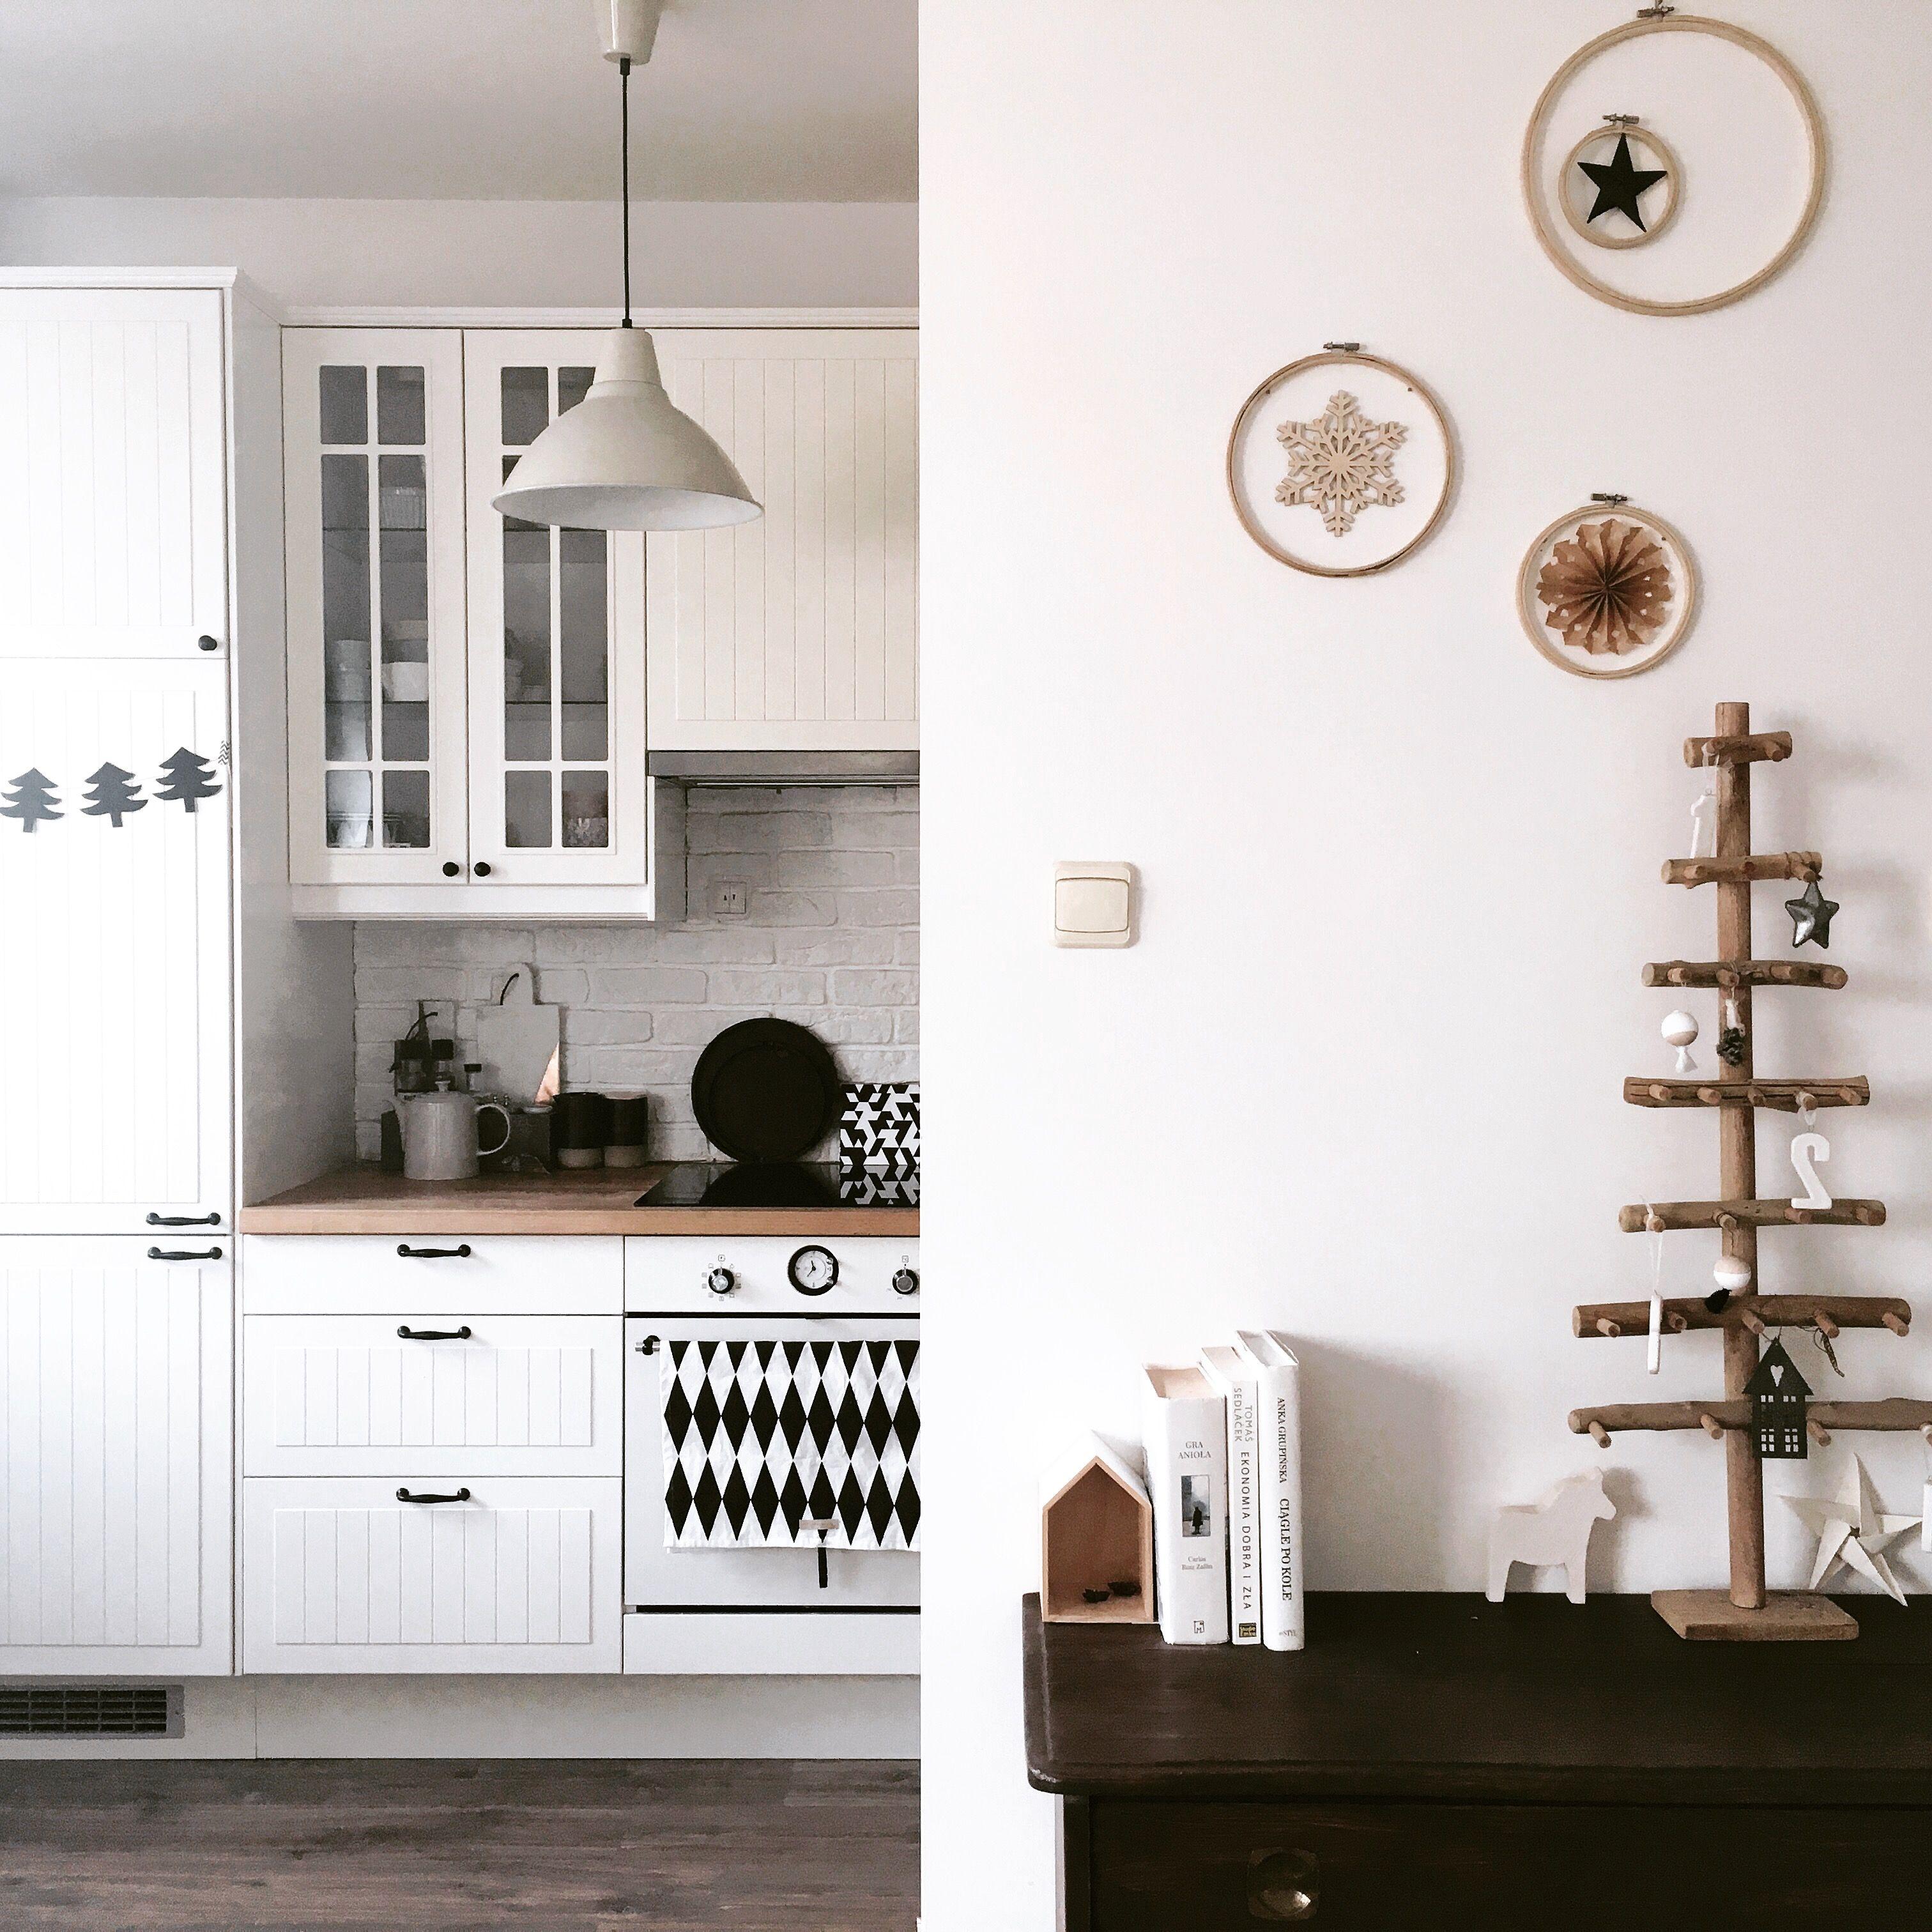 Nordic design • Scandinavian interior • White kitchen • IKEA ...